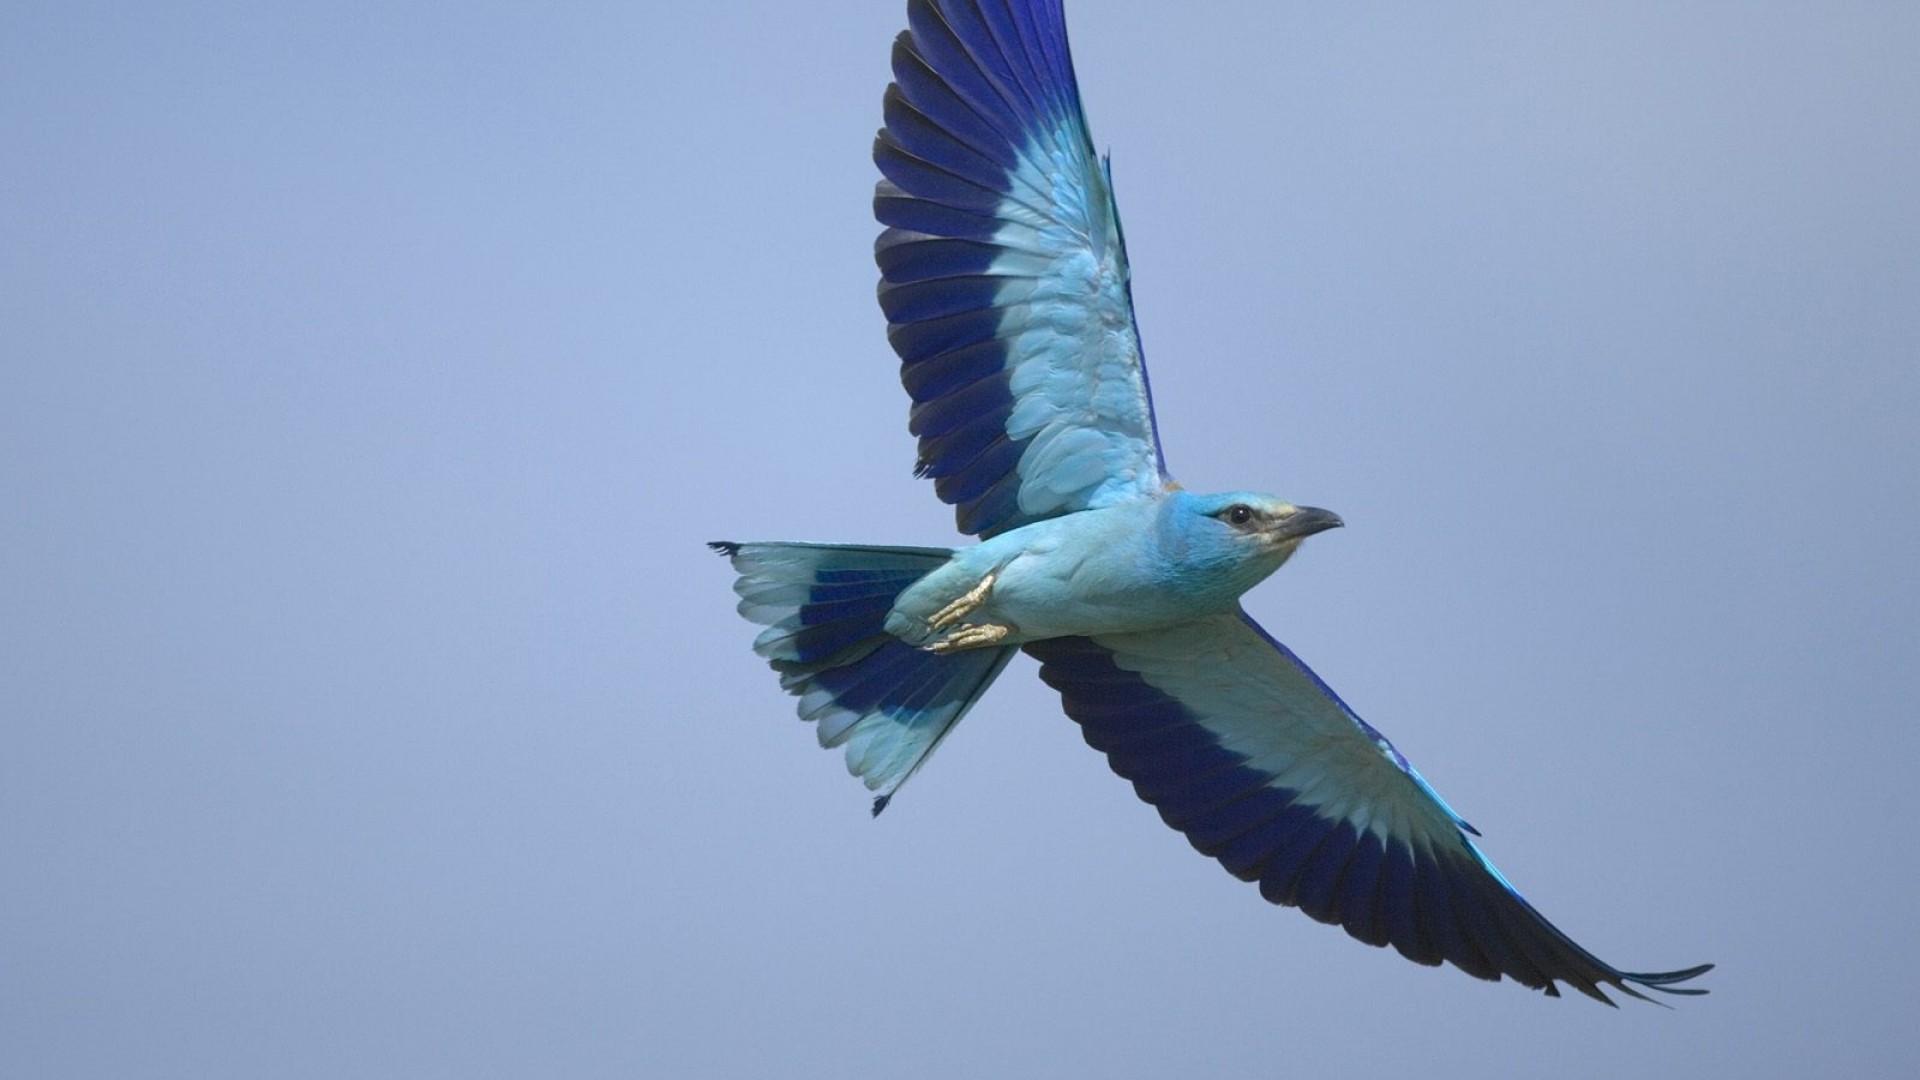 Pin Blue-bird-flying on Pinterest